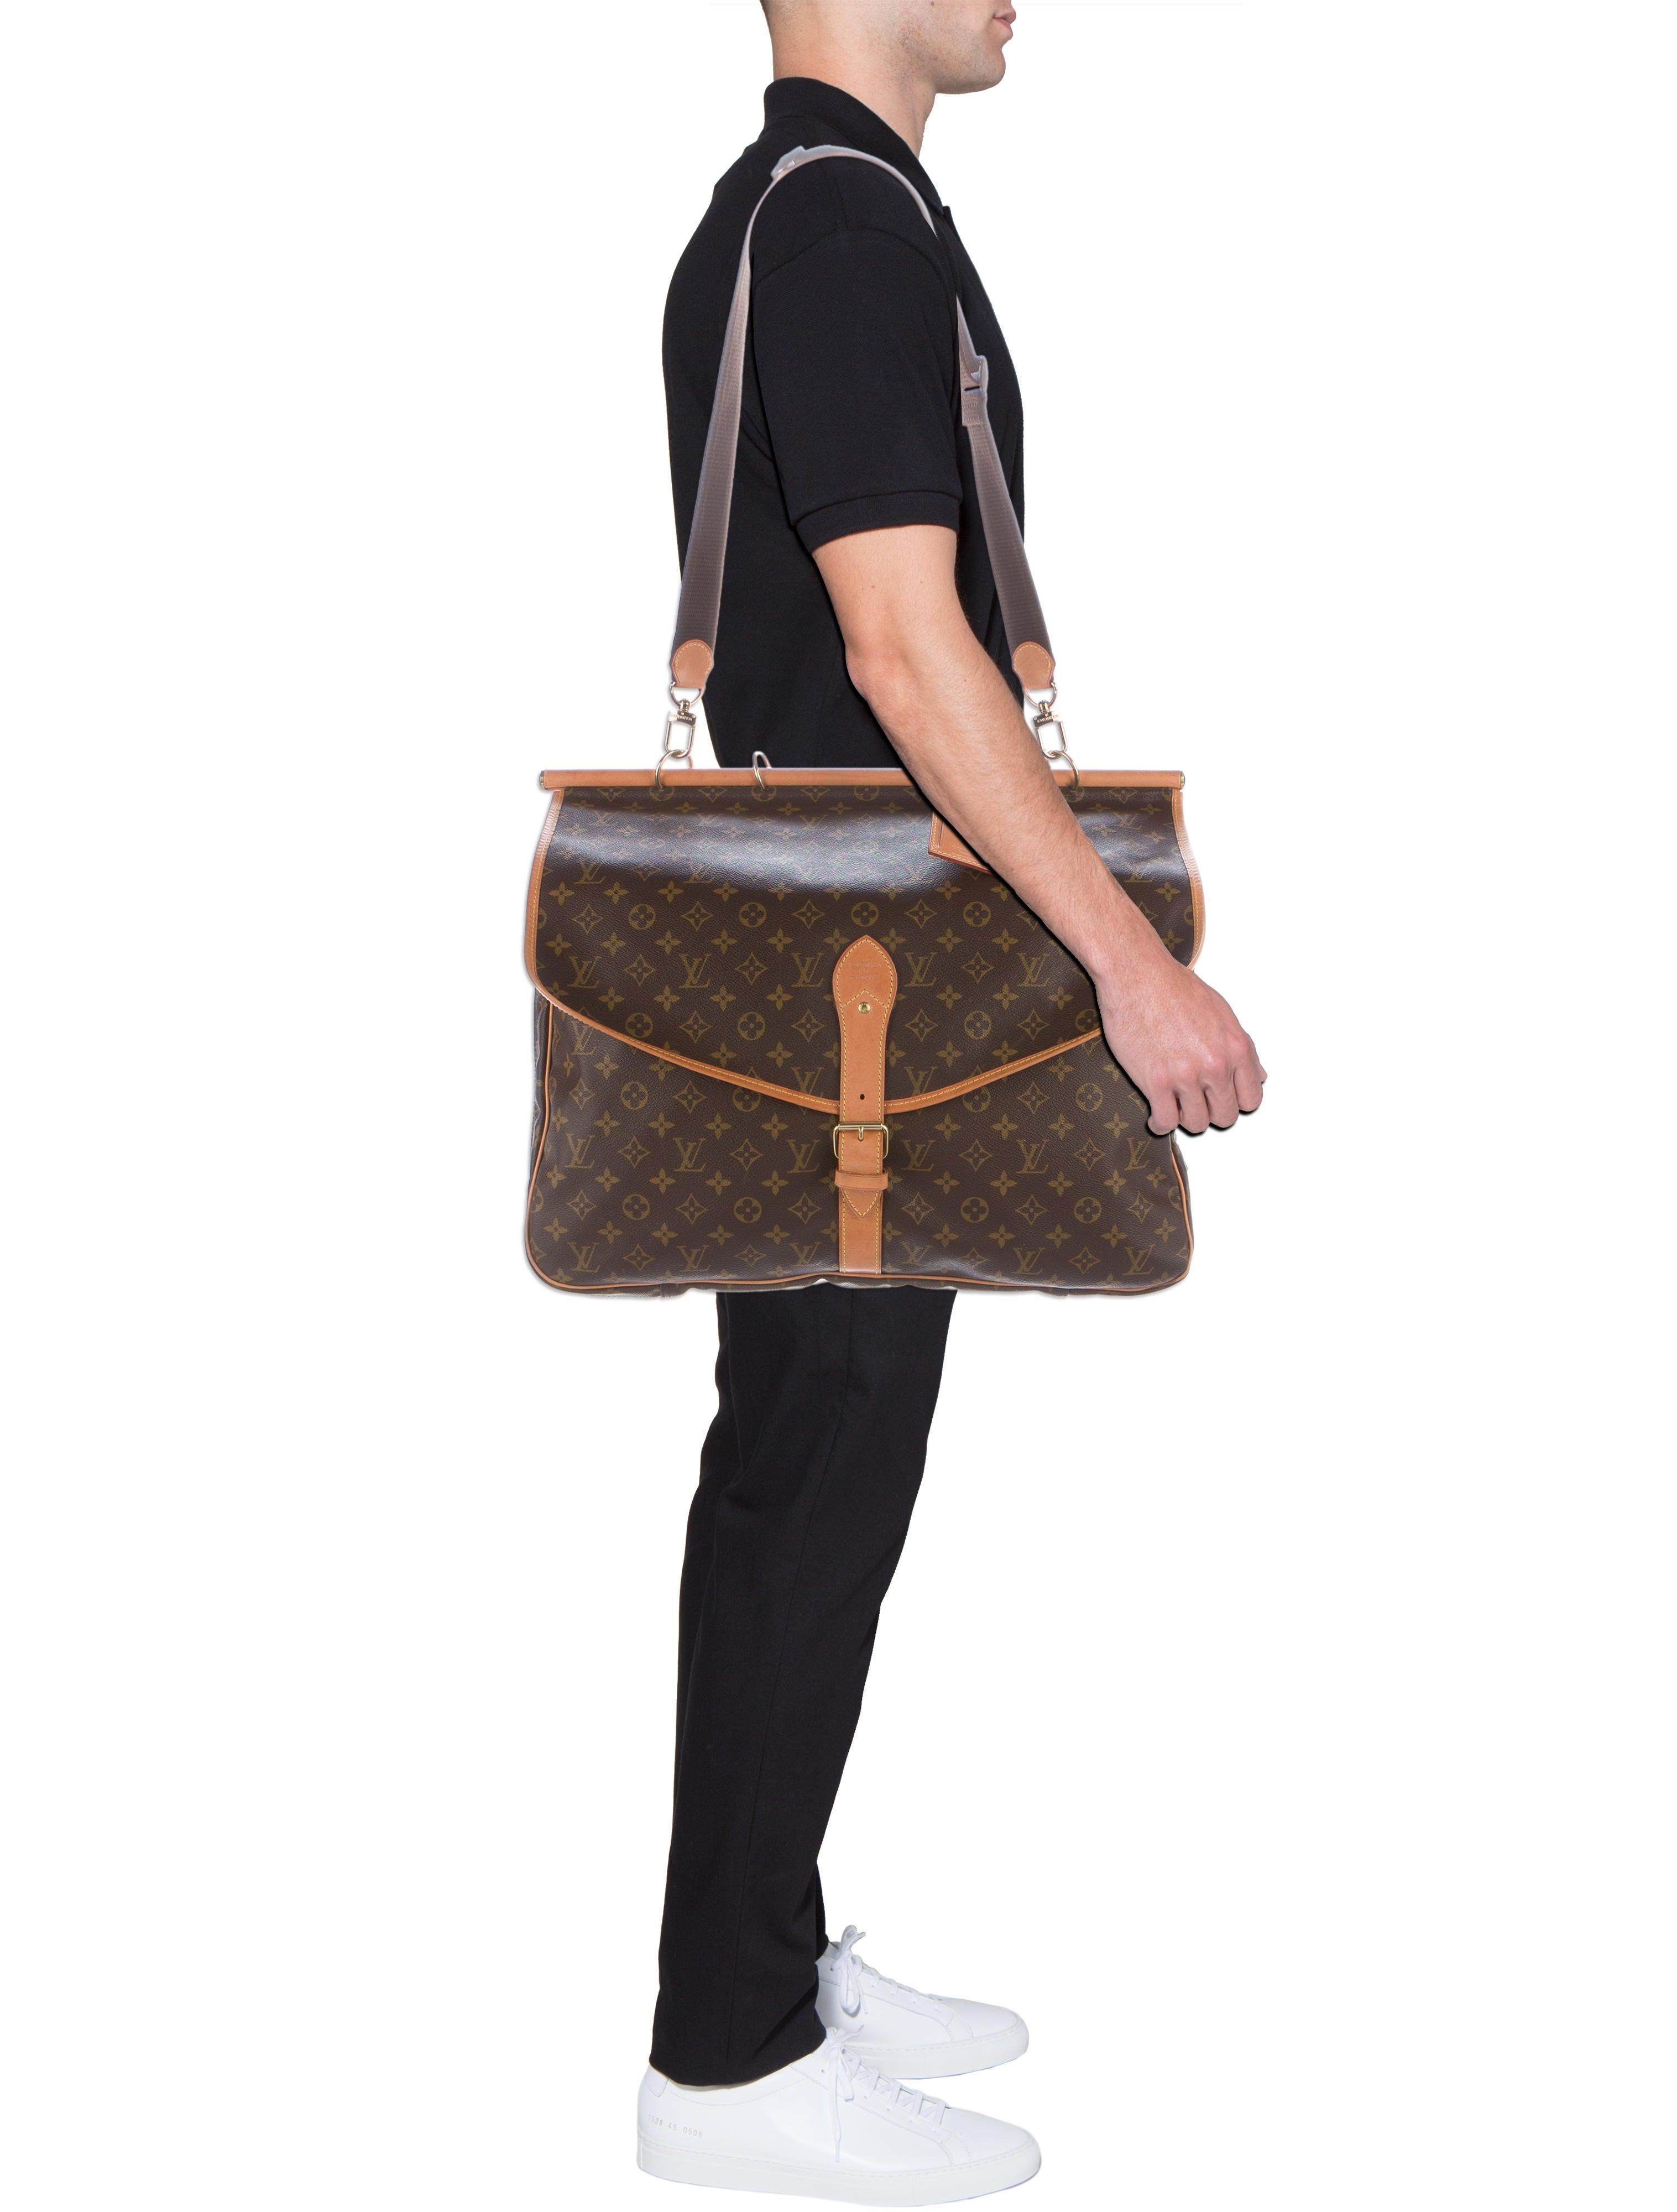 Sac Louis Vuitton Matelassé : Louis vuitton monogram sac chasse bags lou the